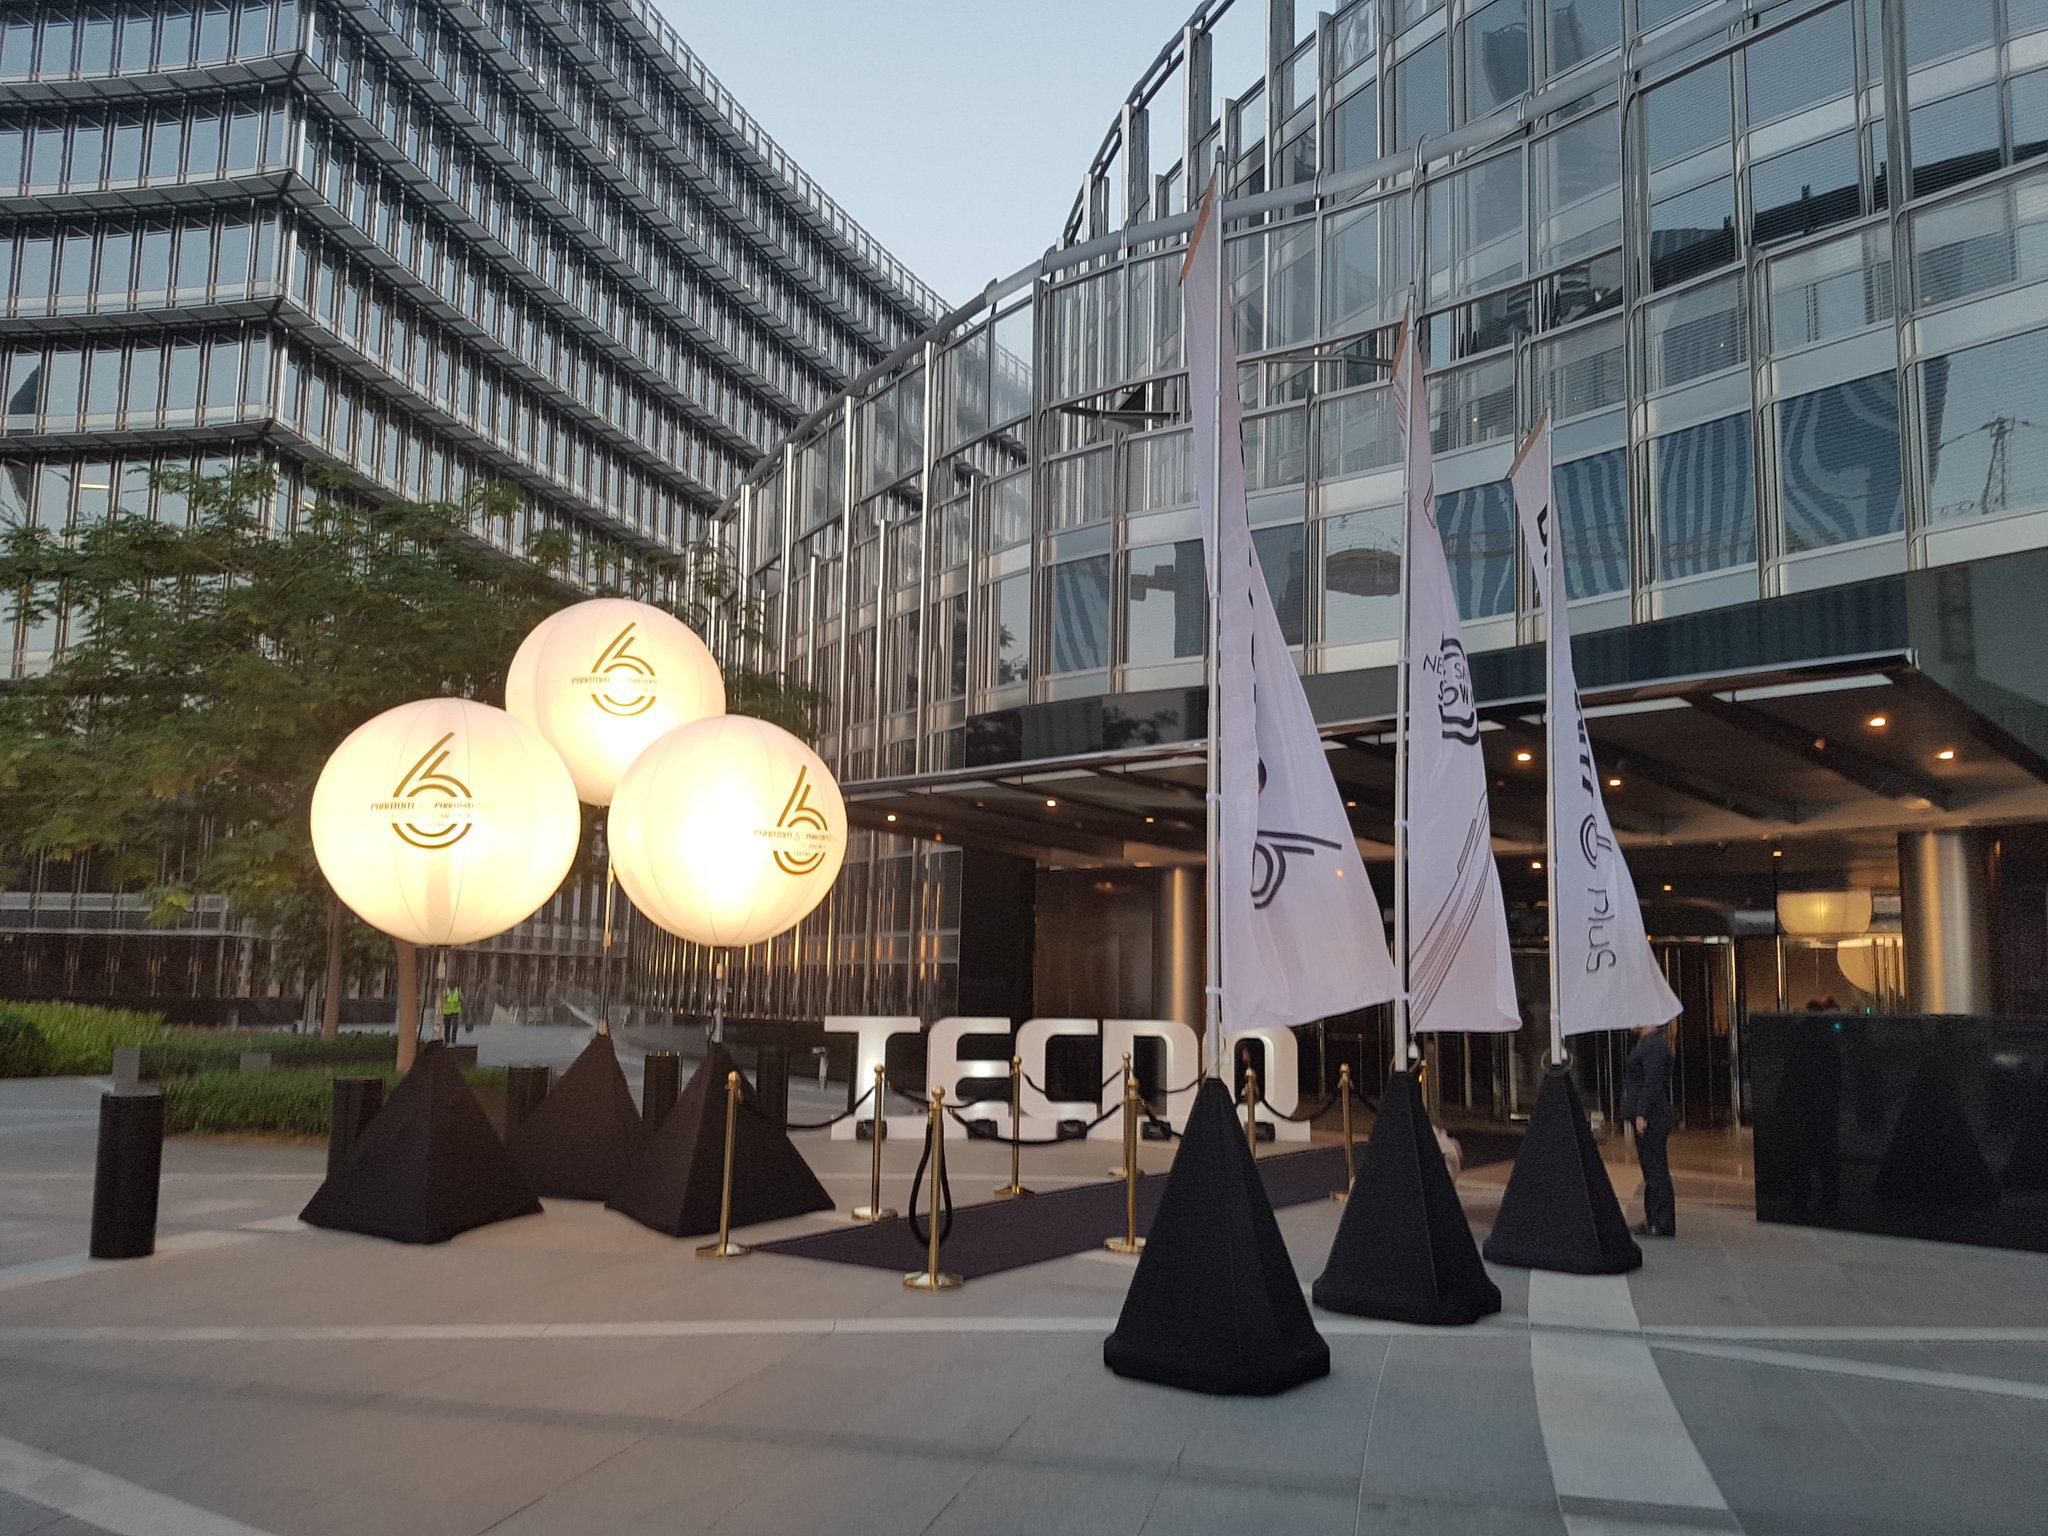 tecno phantom 6 launch